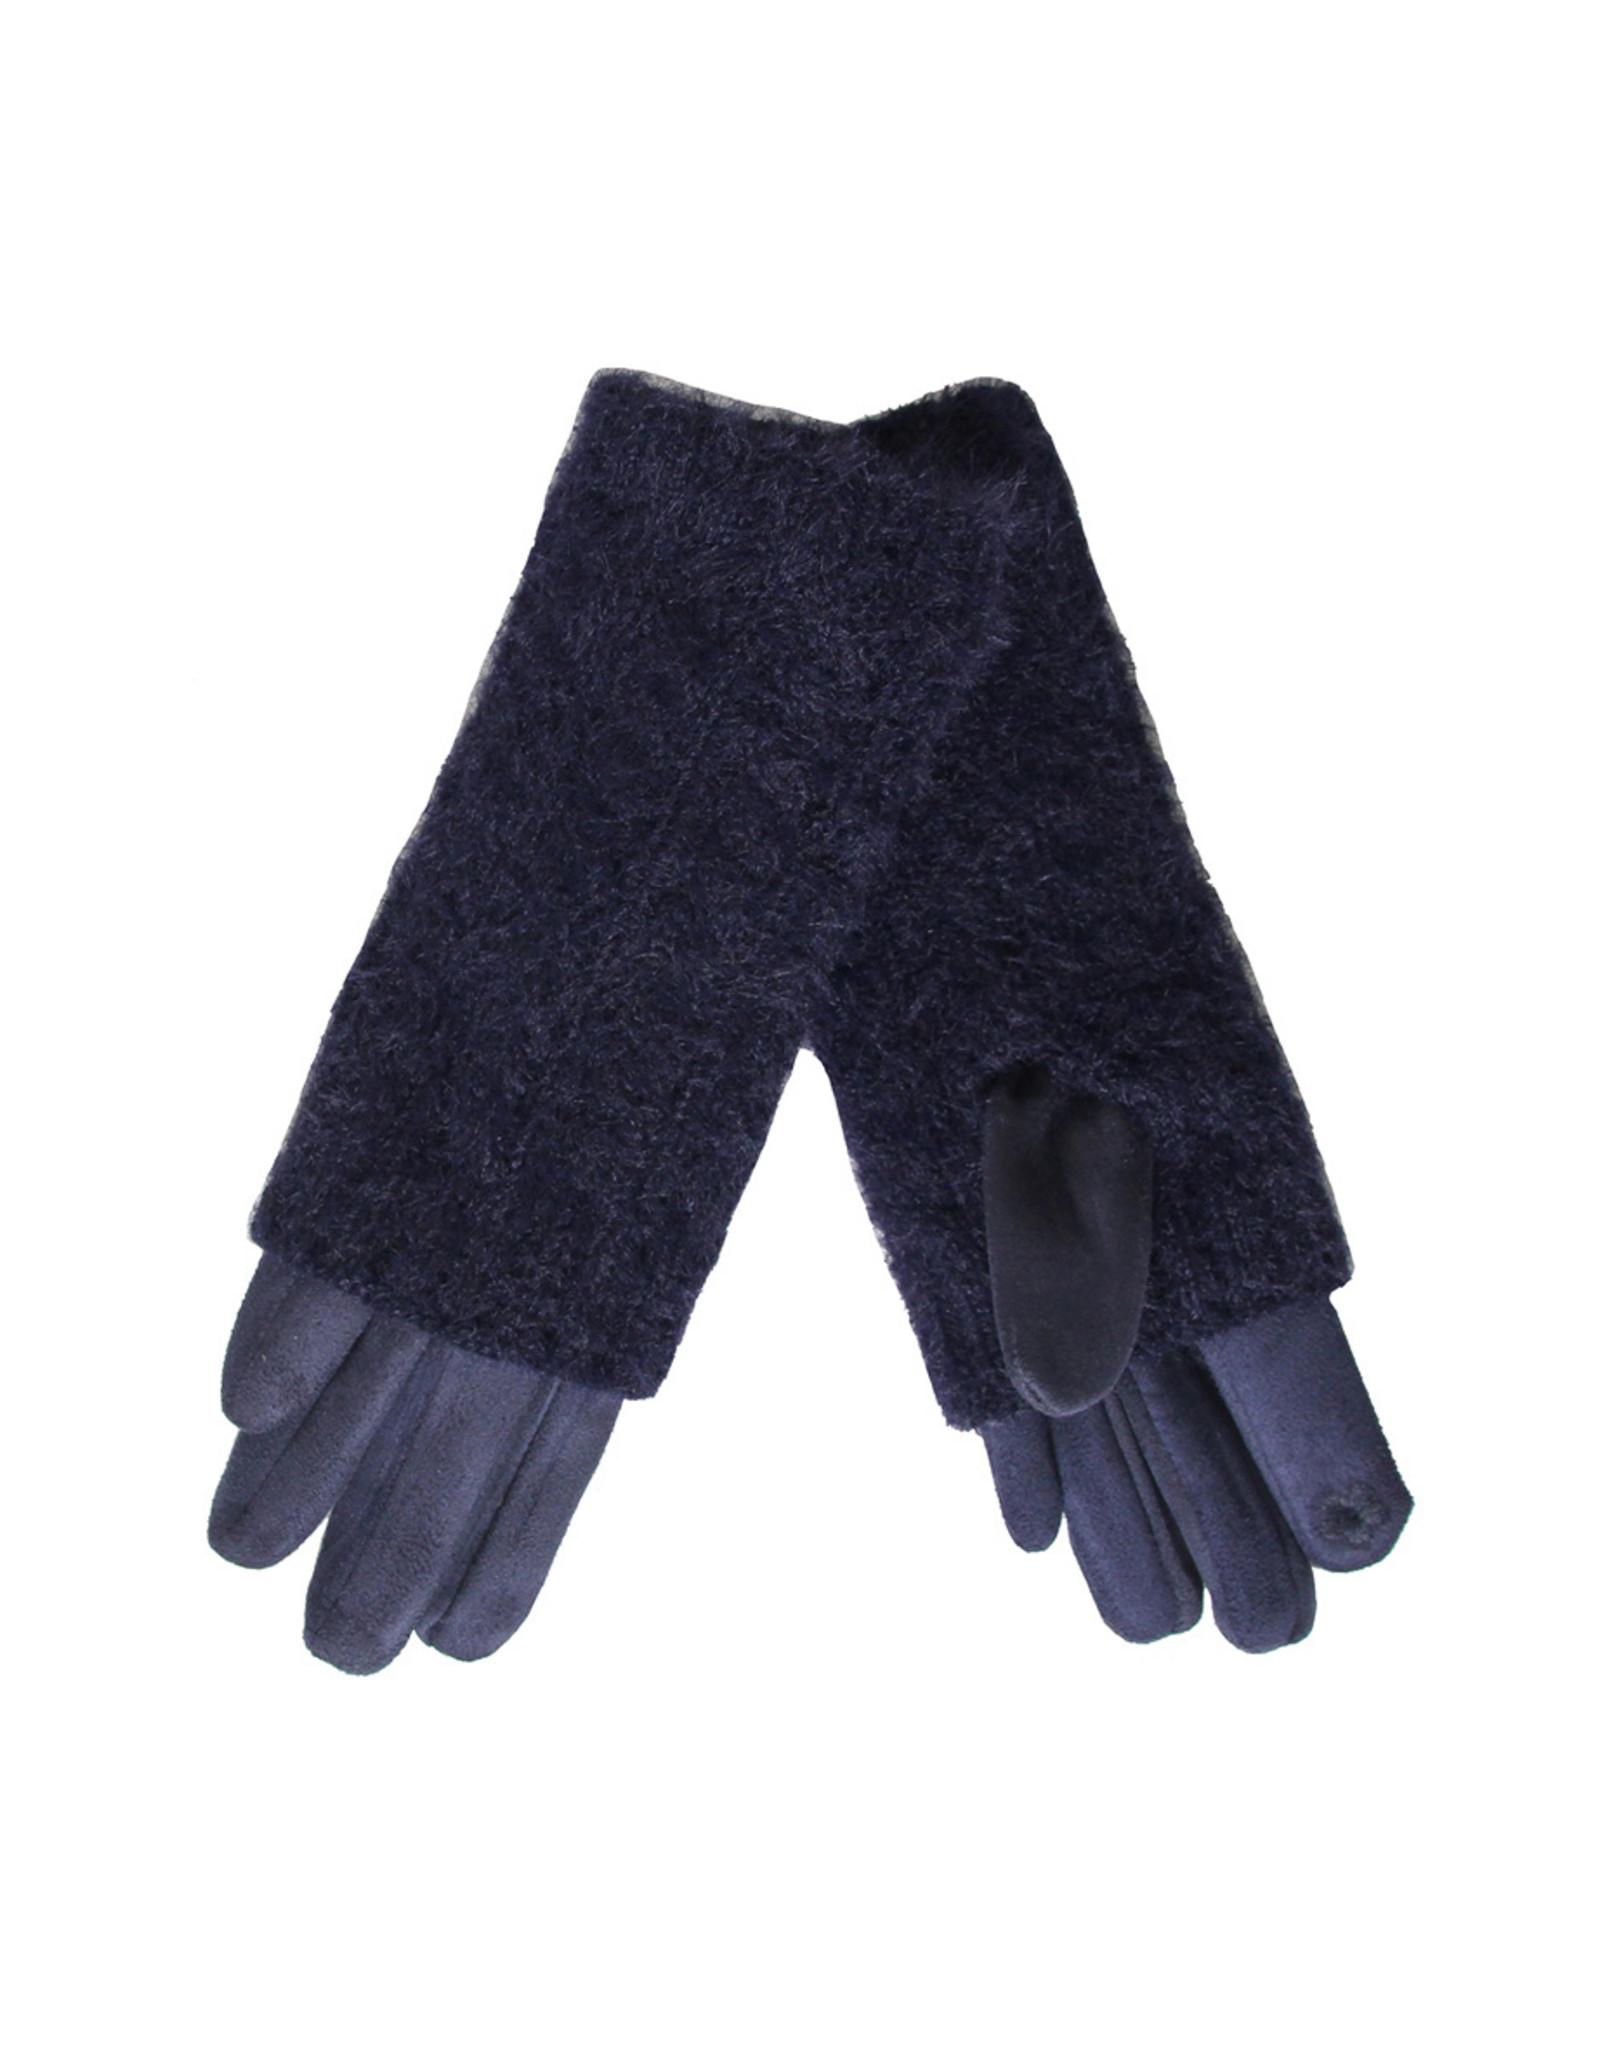 PARIS ES'TYL Chenille Covered Fleece Gloves